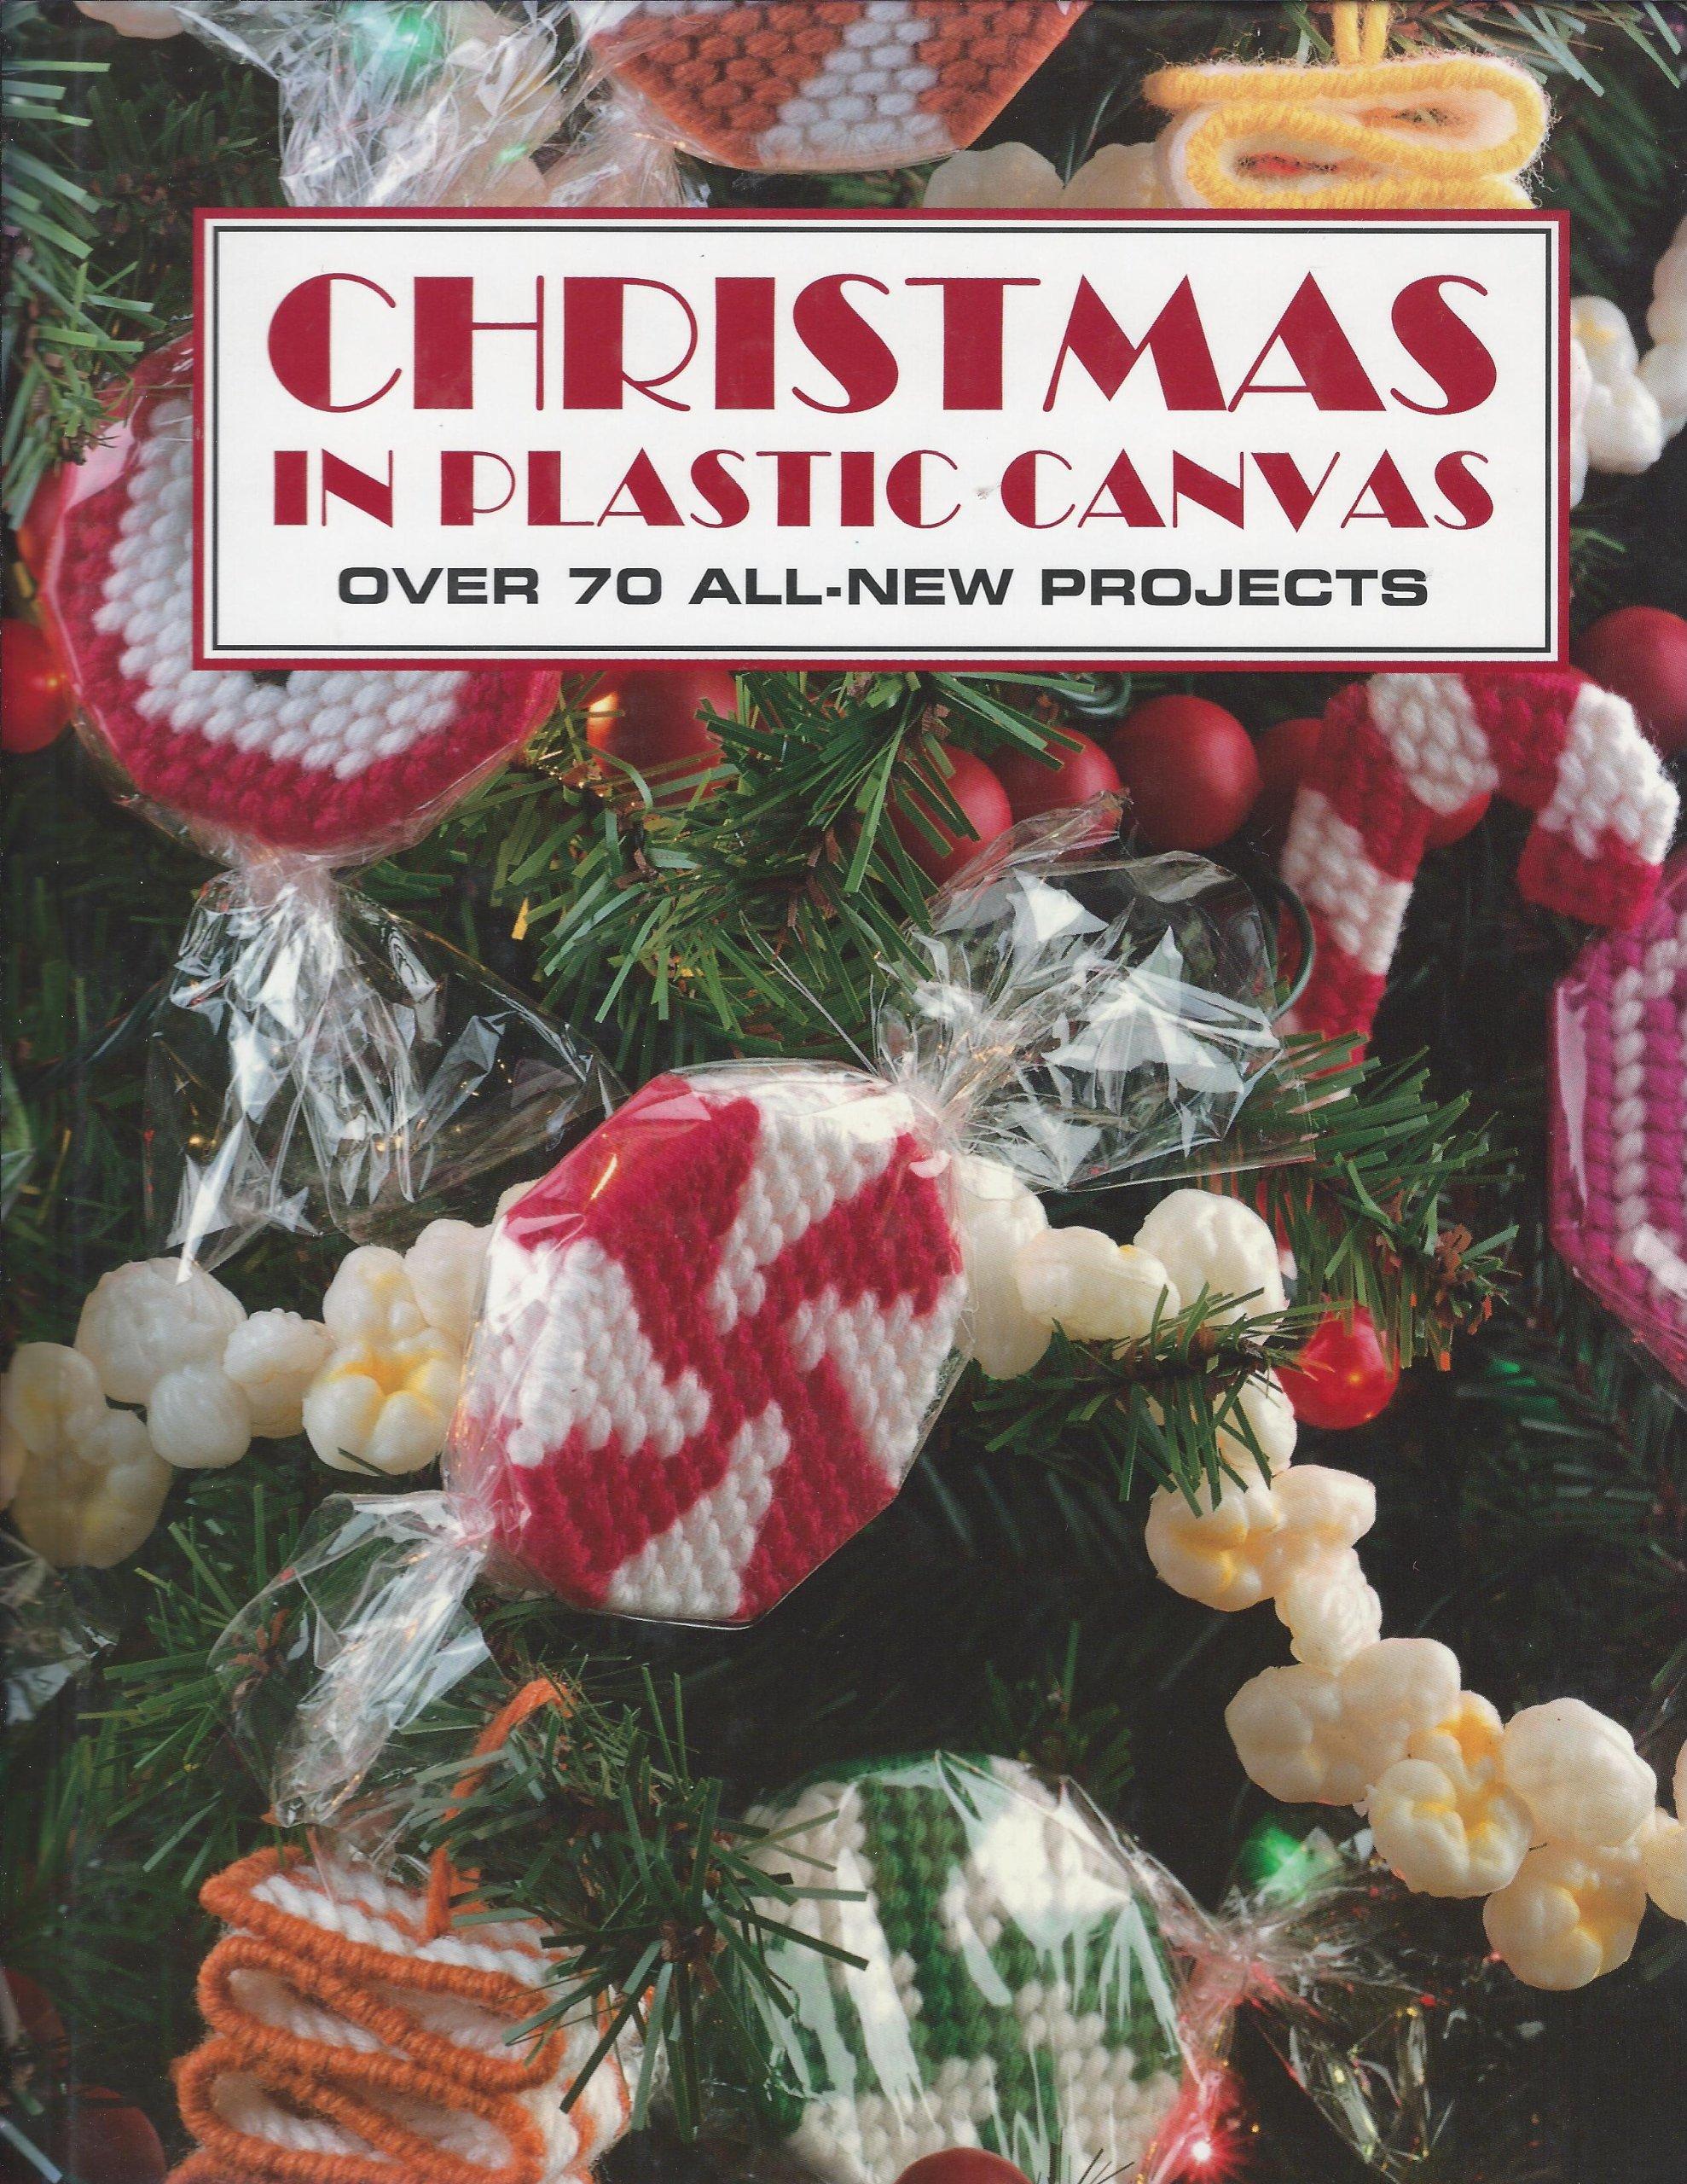 Plastic Canvas Christmas Ornament Patterns.Free Plastic Canvas Christmas Patterns Browse Patterns